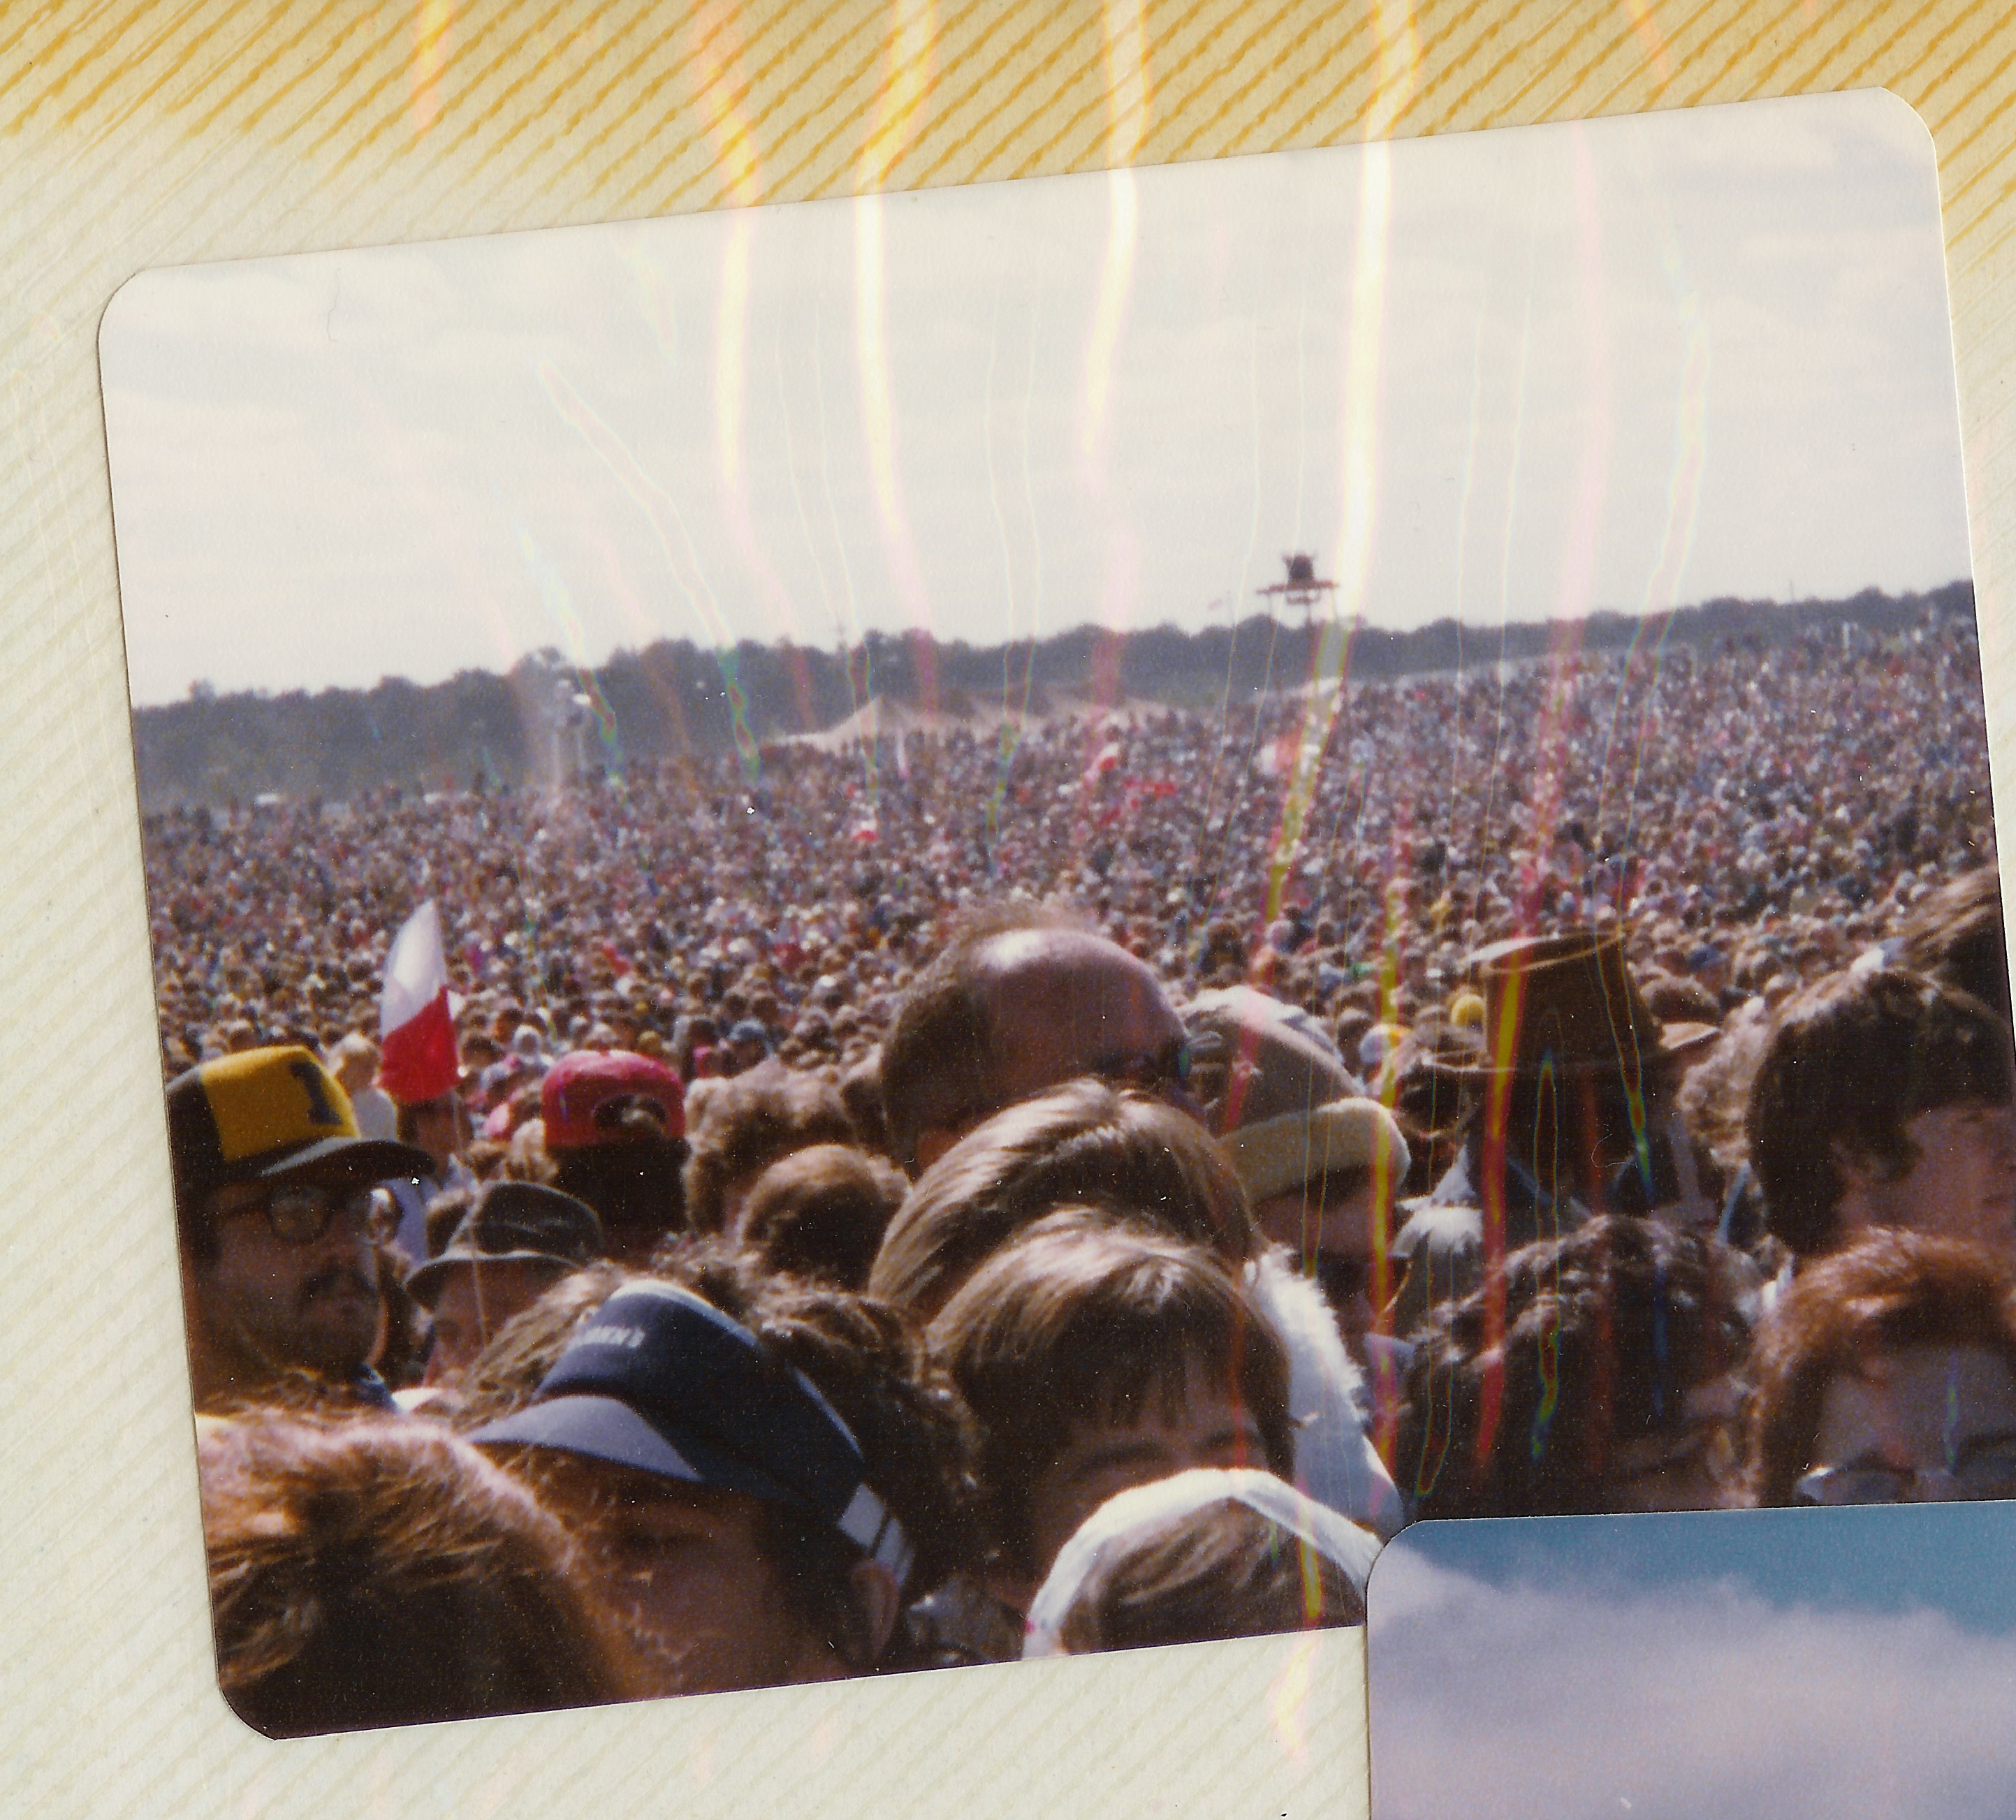 October 4, 1979 - The Pilgrim People